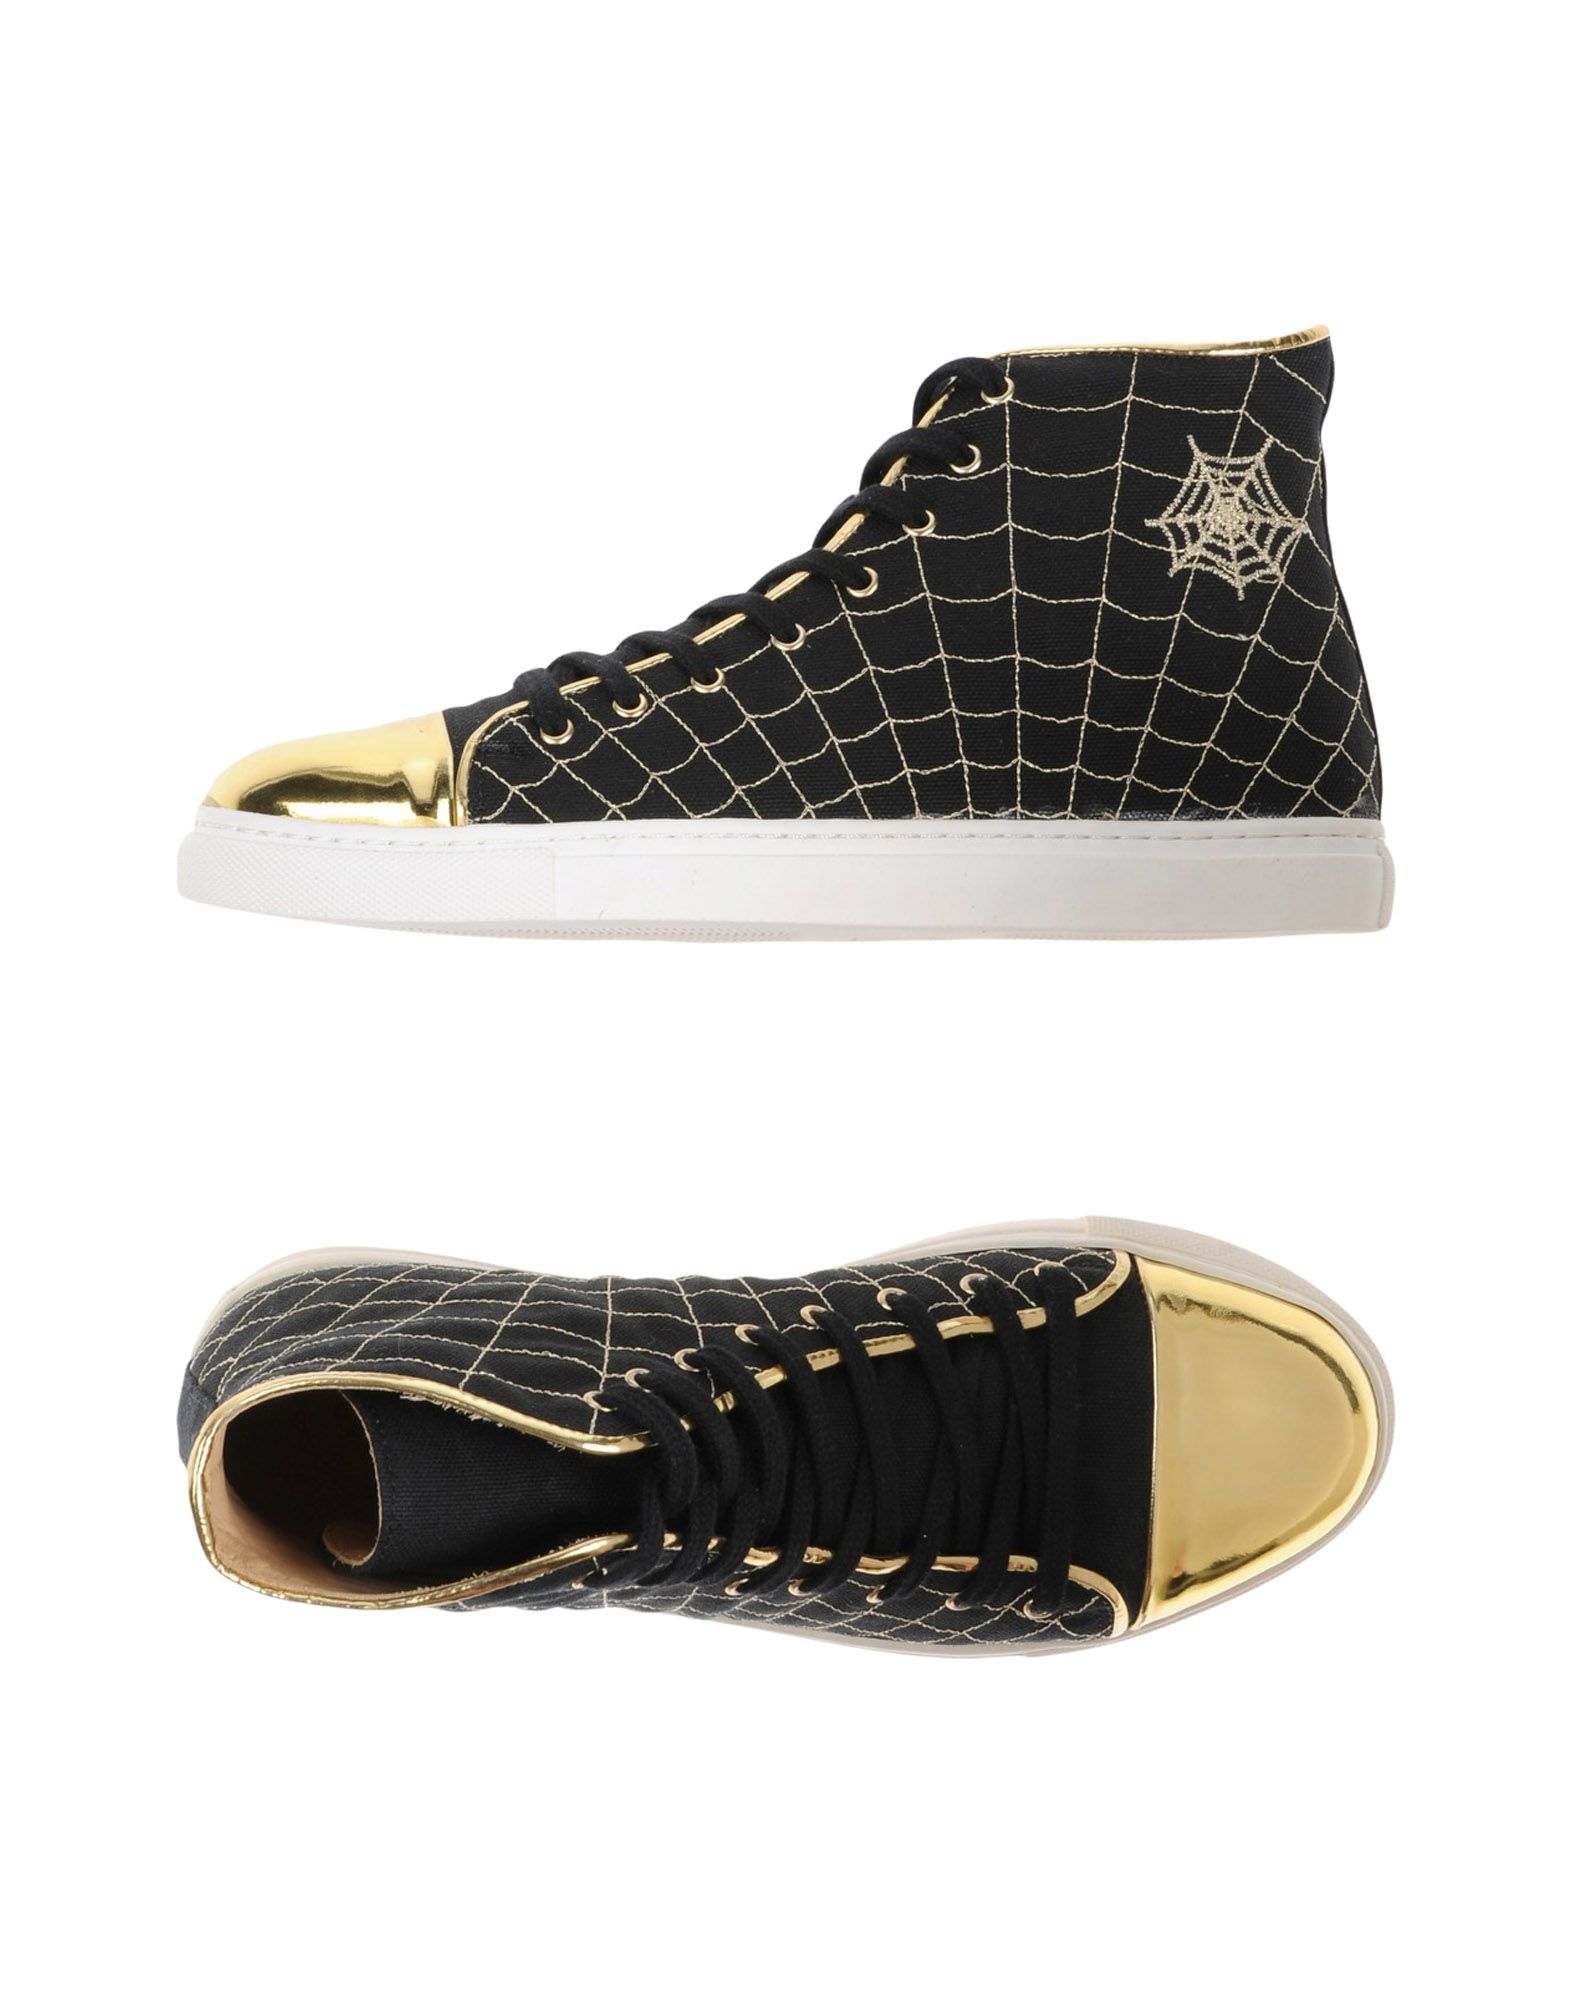 Rabatt Damen Schuhe Charlotte Olympia Sneakers Damen Rabatt  11248754DN a59324